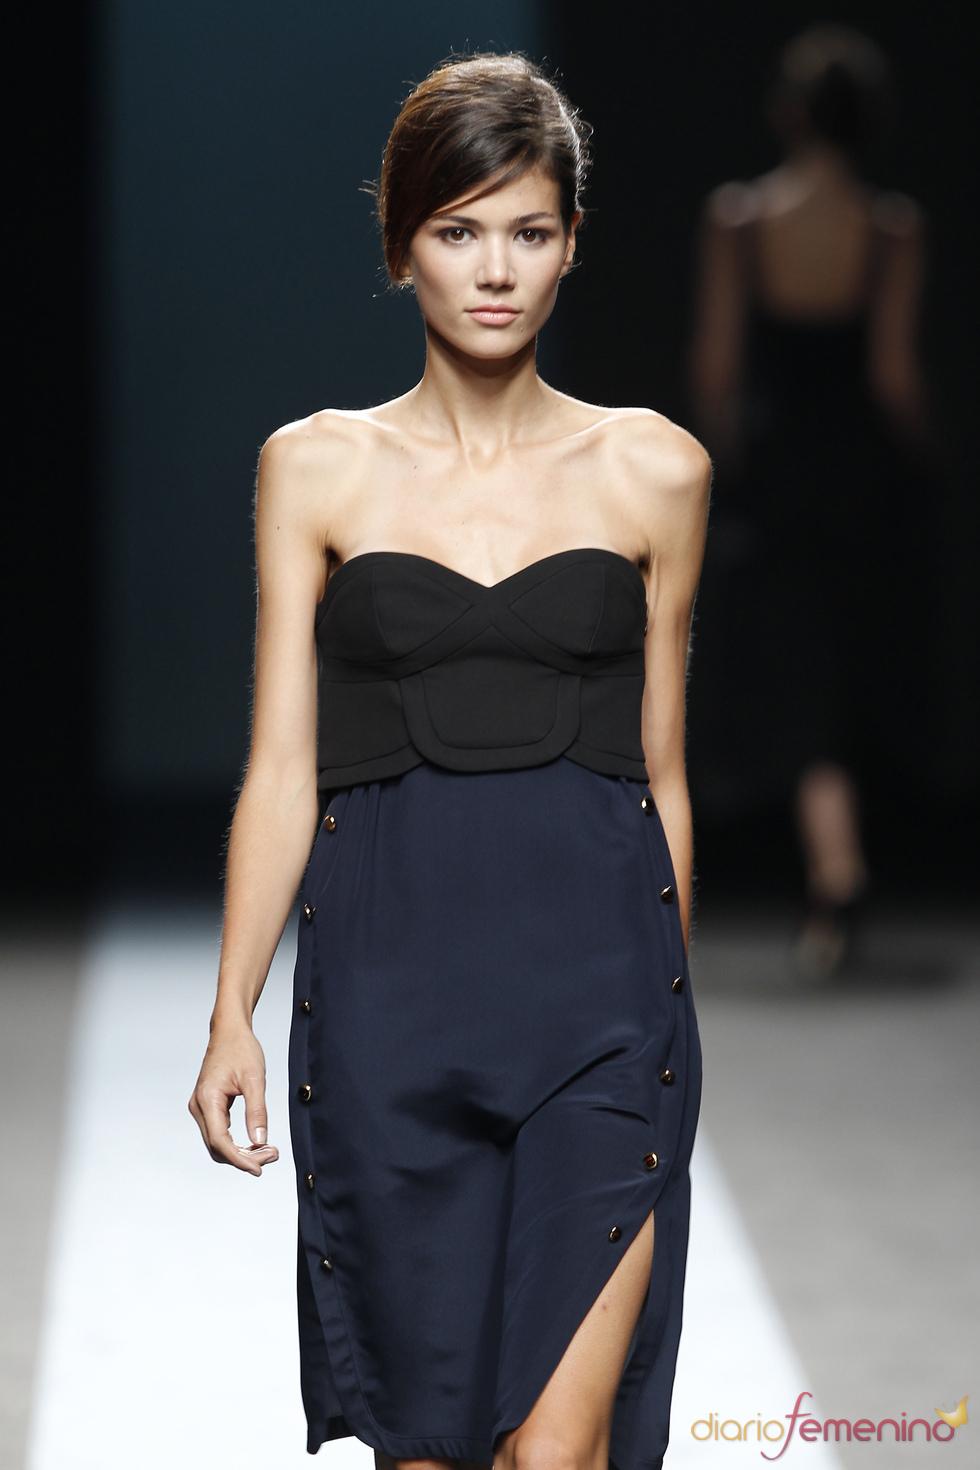 Cibeles Madrid Fashion Week 09-2010: Miguel Palacio